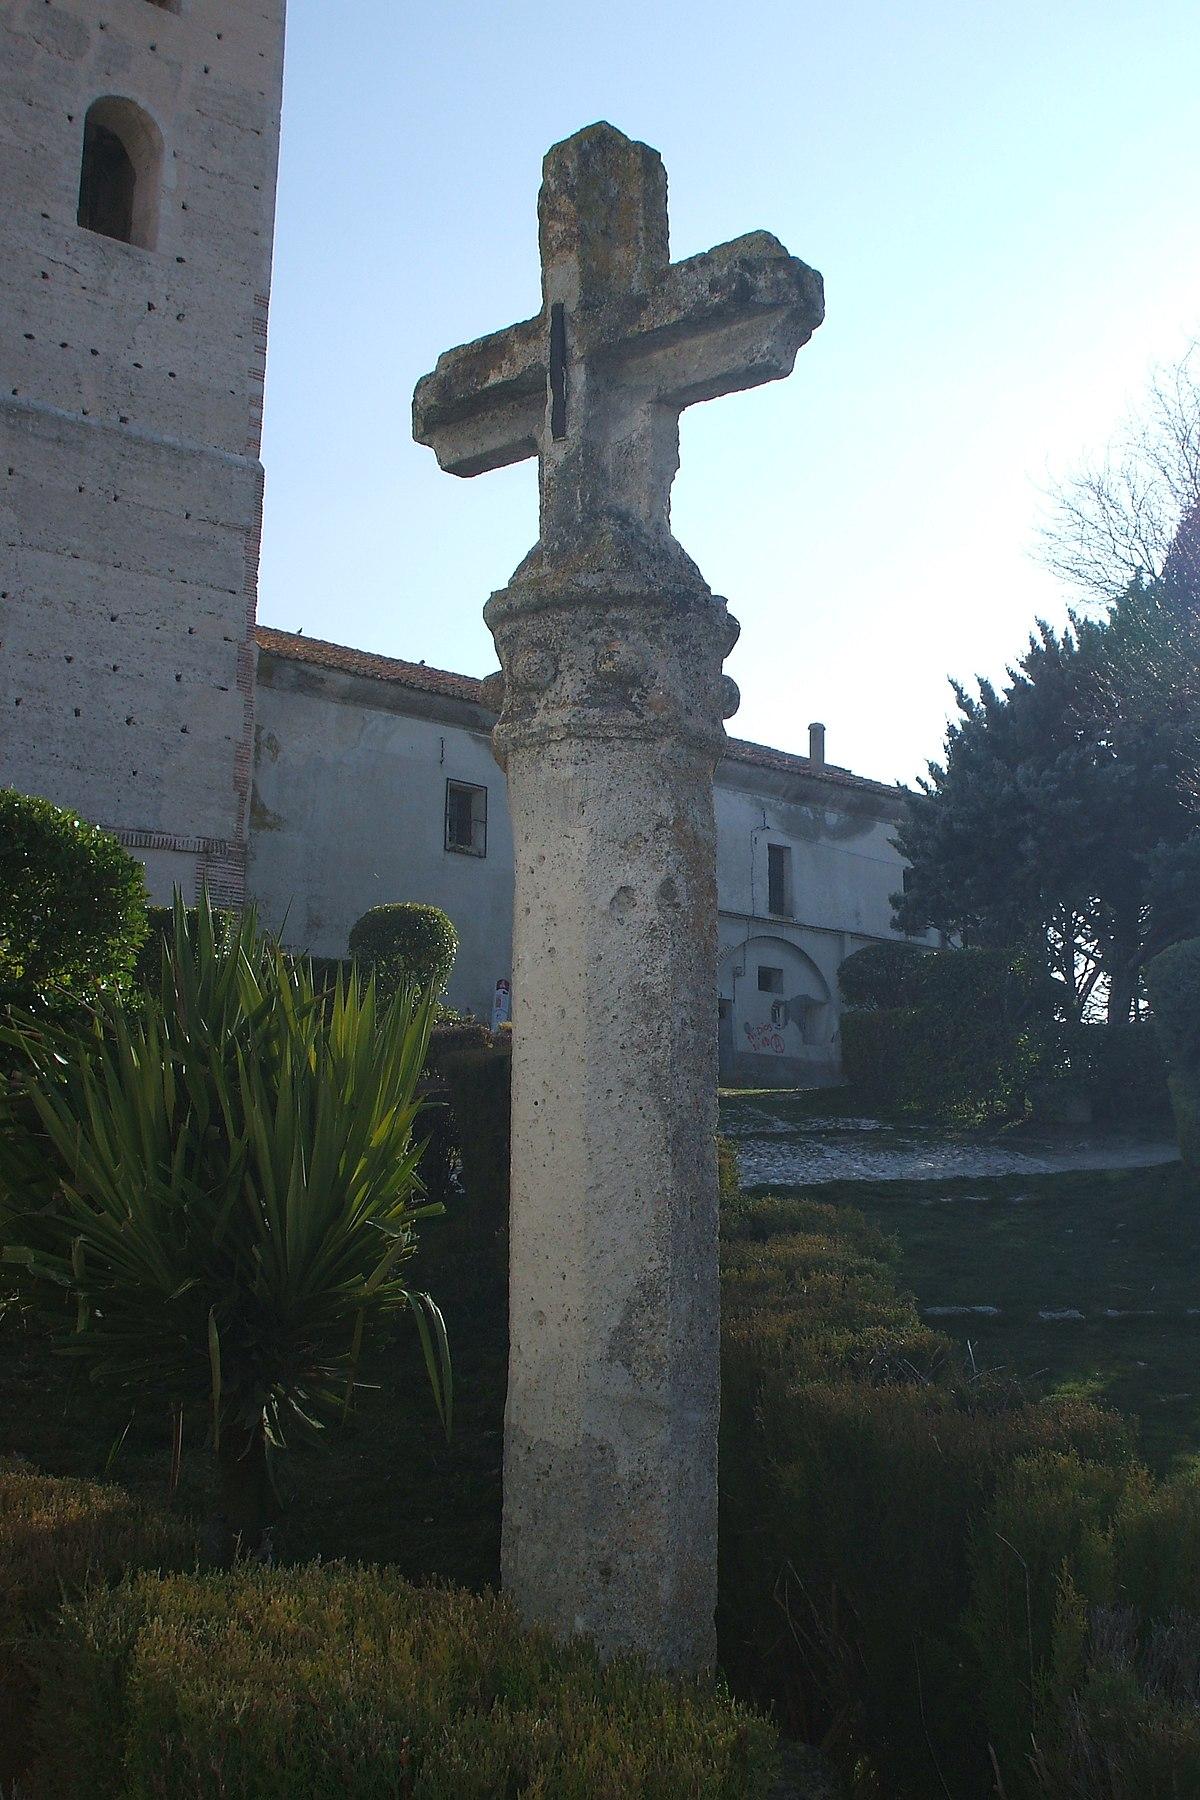 Calle santa cruz 2 san lorenzo tlalmimilolpan teotihuacan edo mex - 1 1